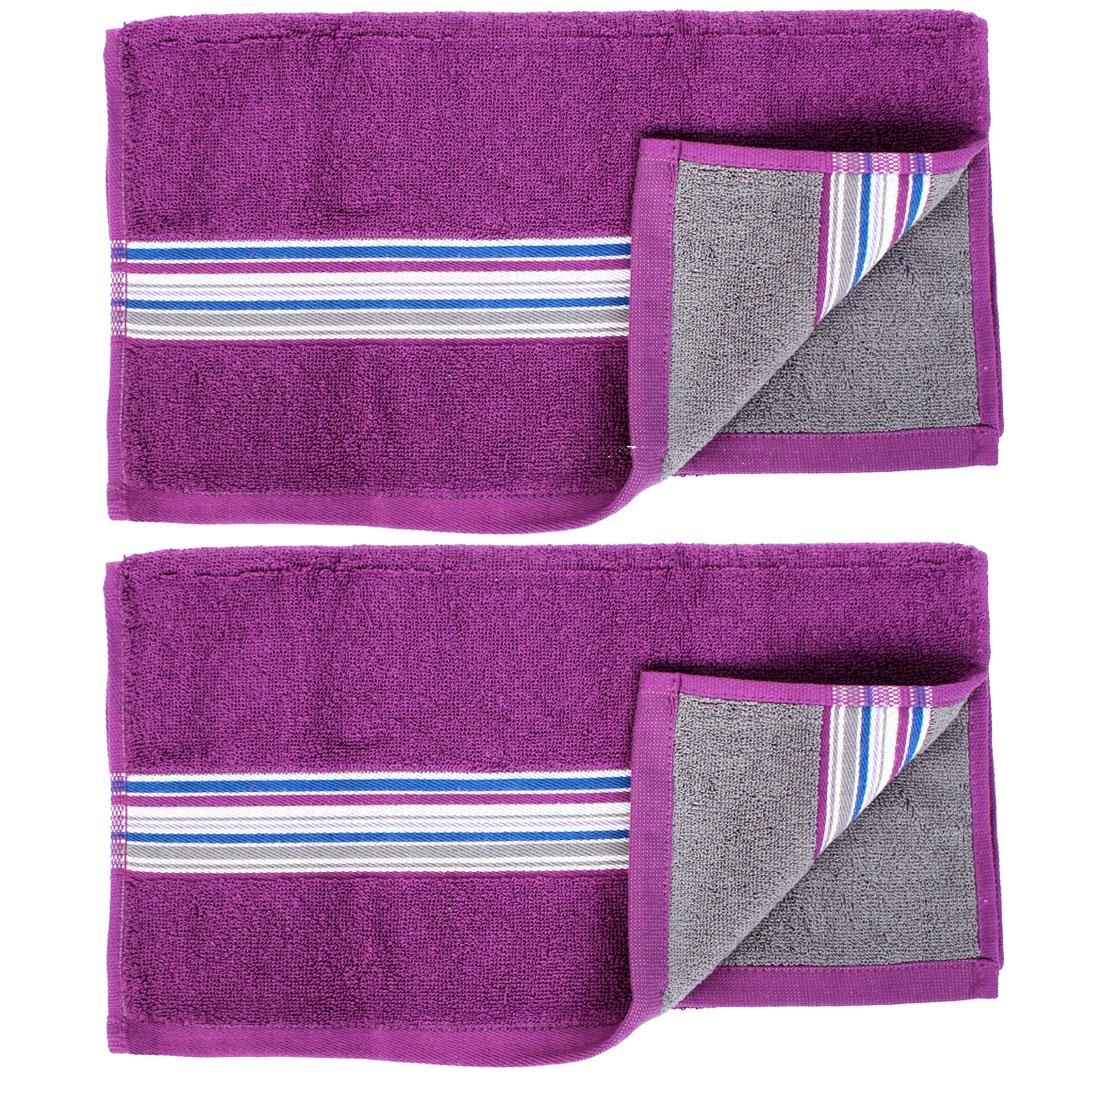 2 Pcs Bamboo Fiber Shower Washing Face Hand Towel Washcloths Purple